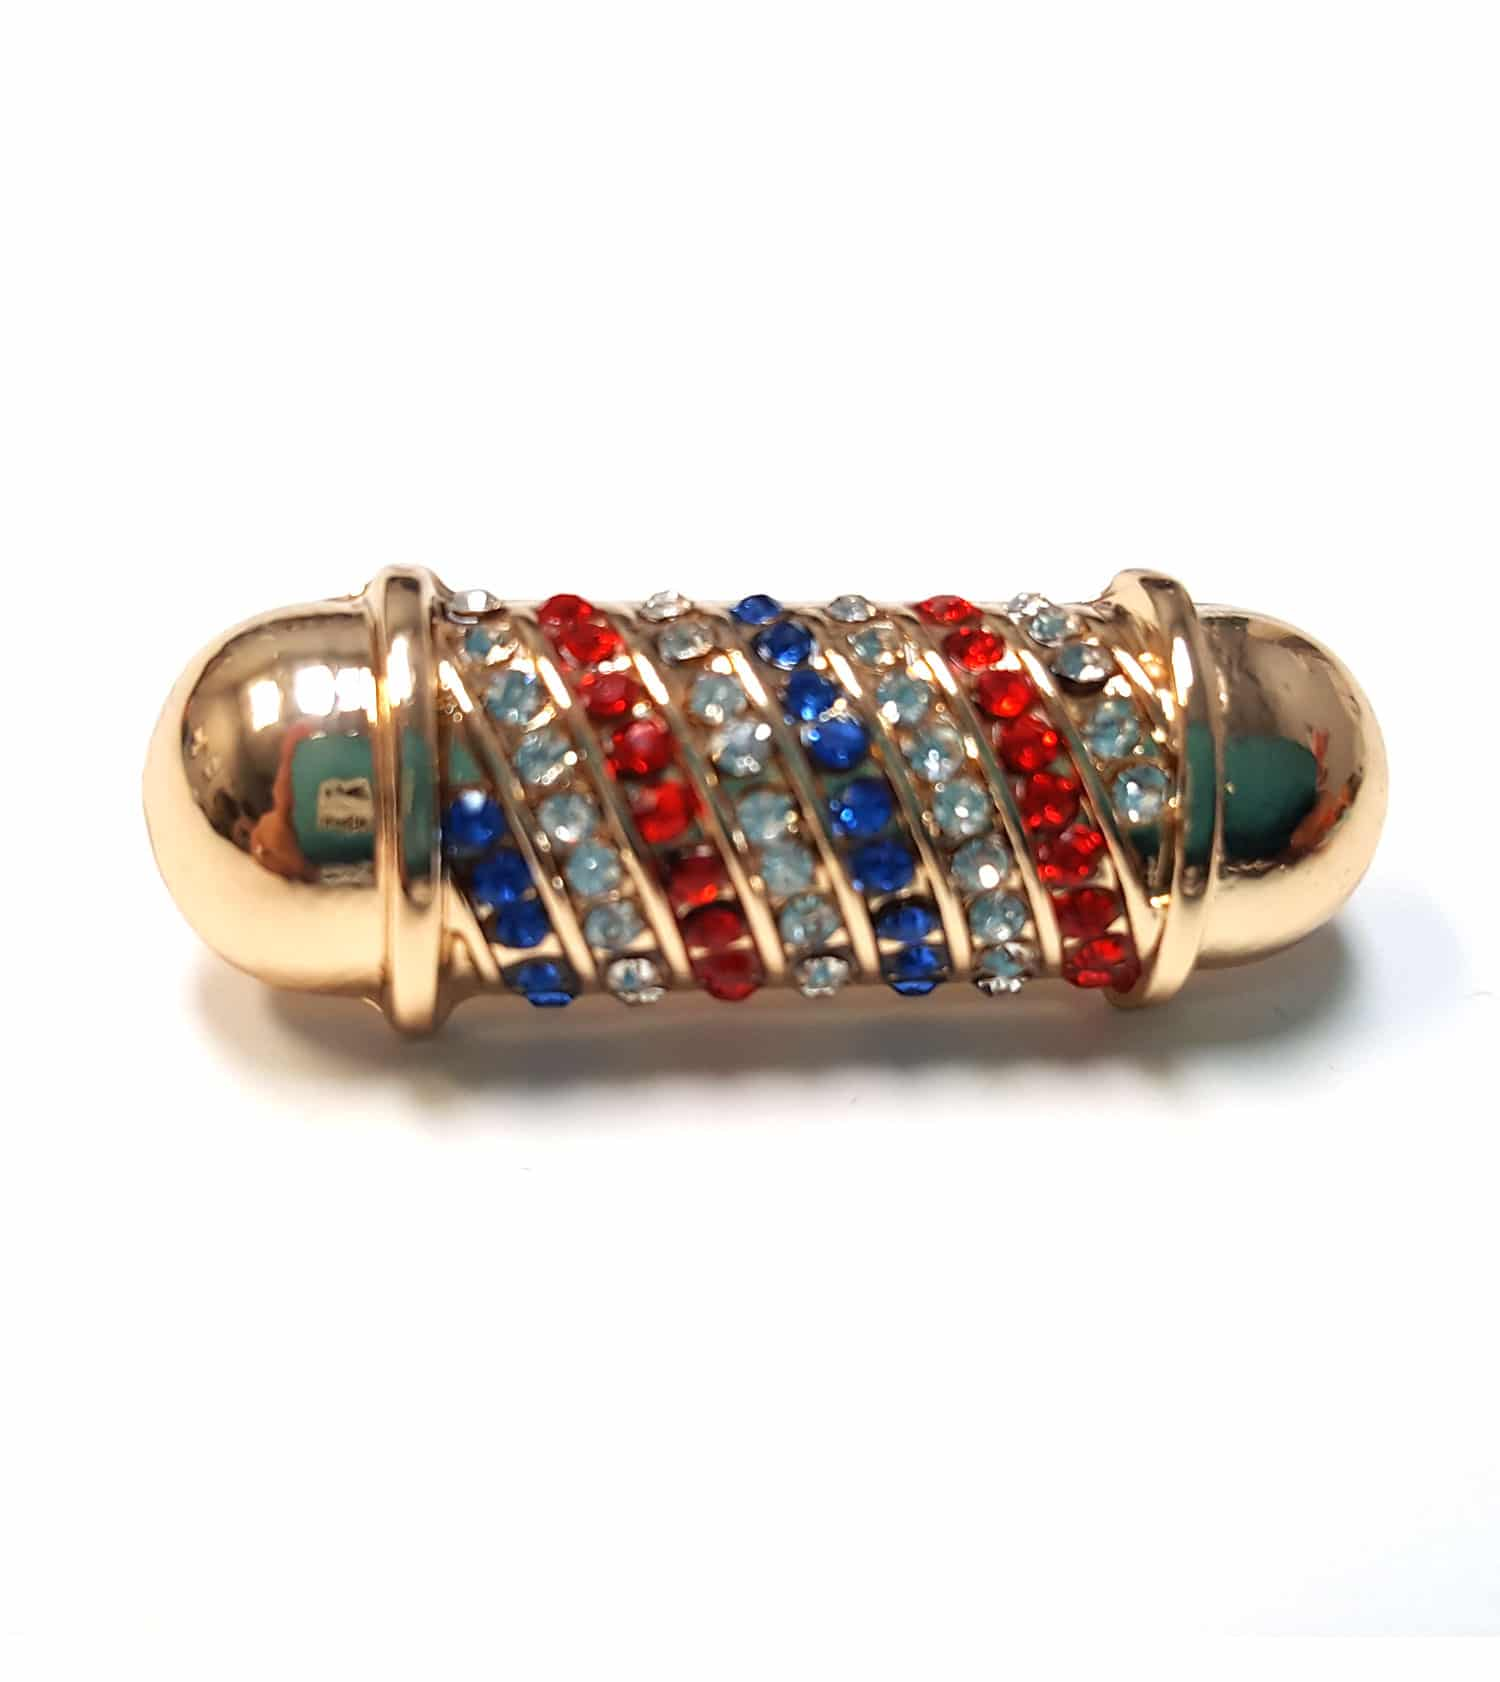 Diamond Barber Pole Lapel Pin (Gold)